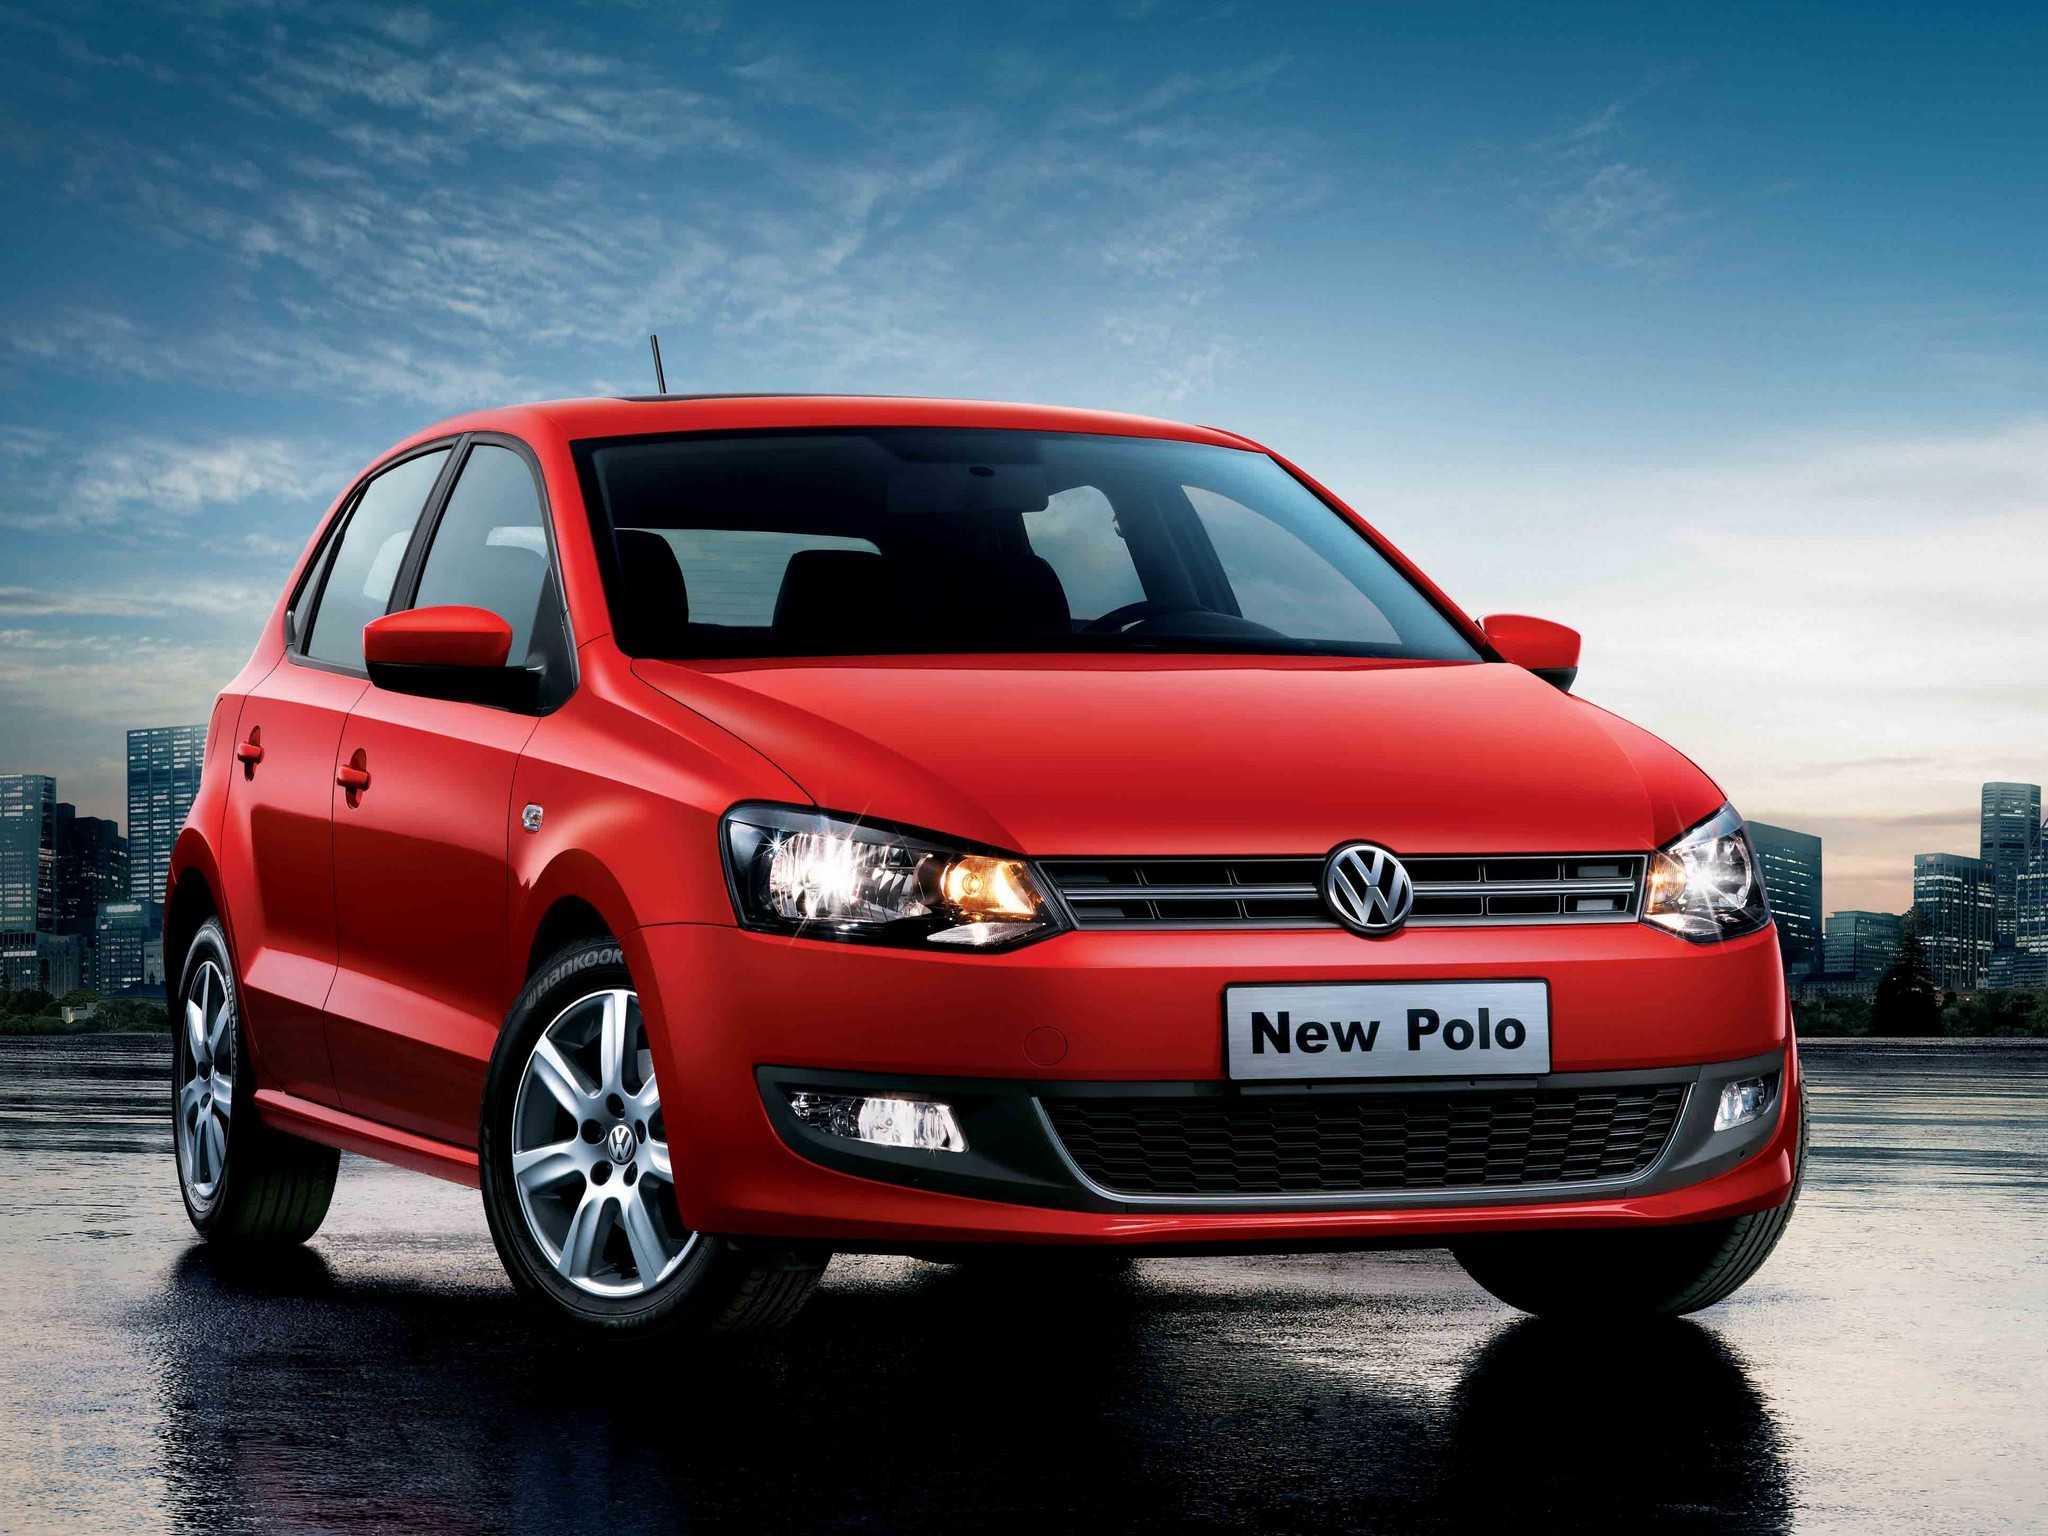 volkswagen polo 5 doors specs 2009 2010 2011 2012 2013 2014 autoevolution. Black Bedroom Furniture Sets. Home Design Ideas